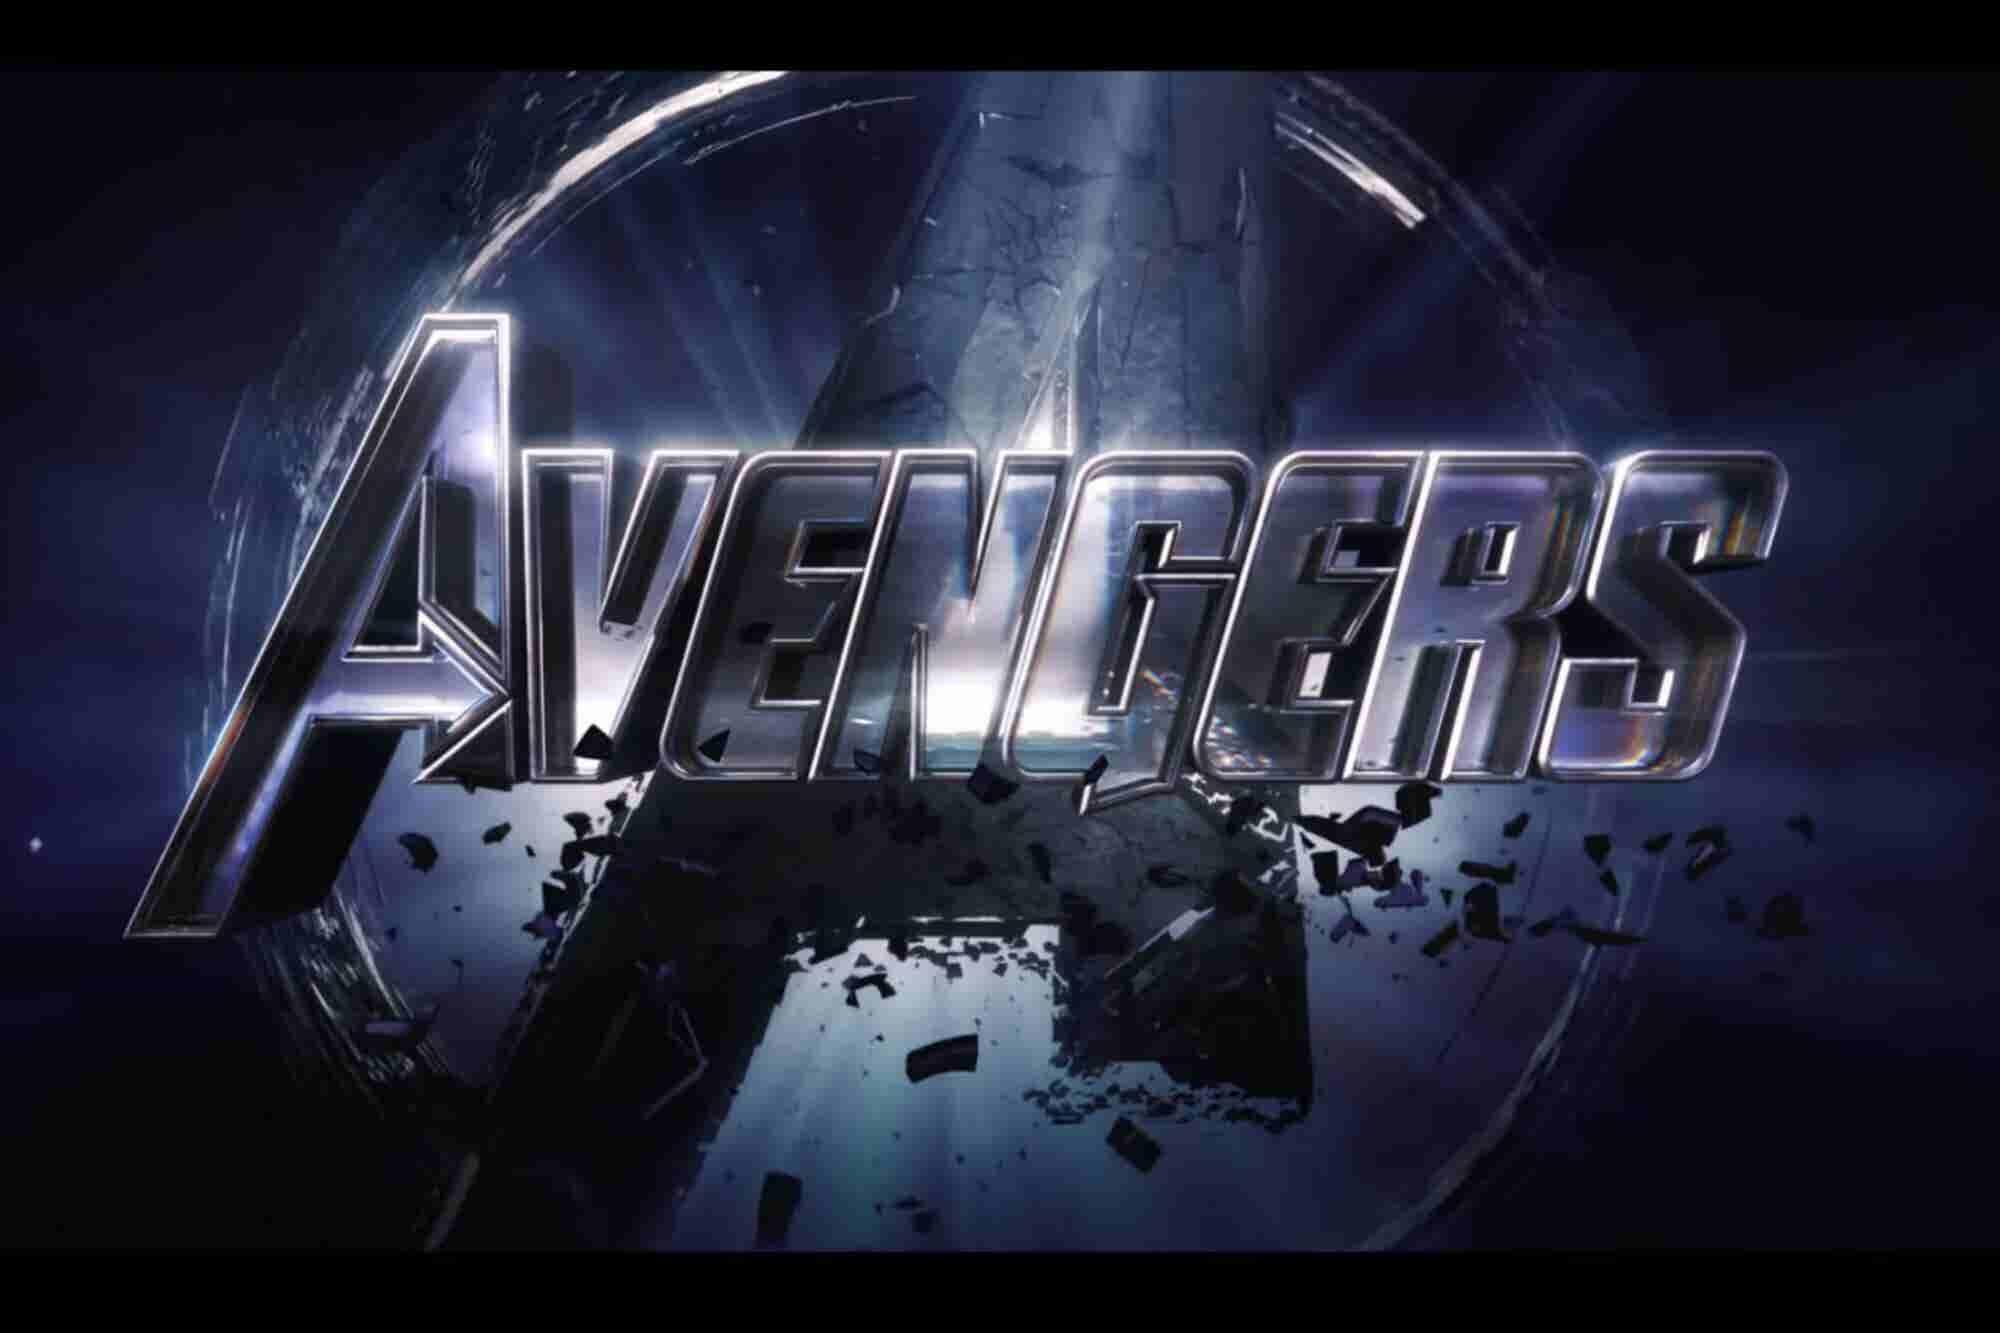 Forma un equipo al estilo Avengers: Endgame